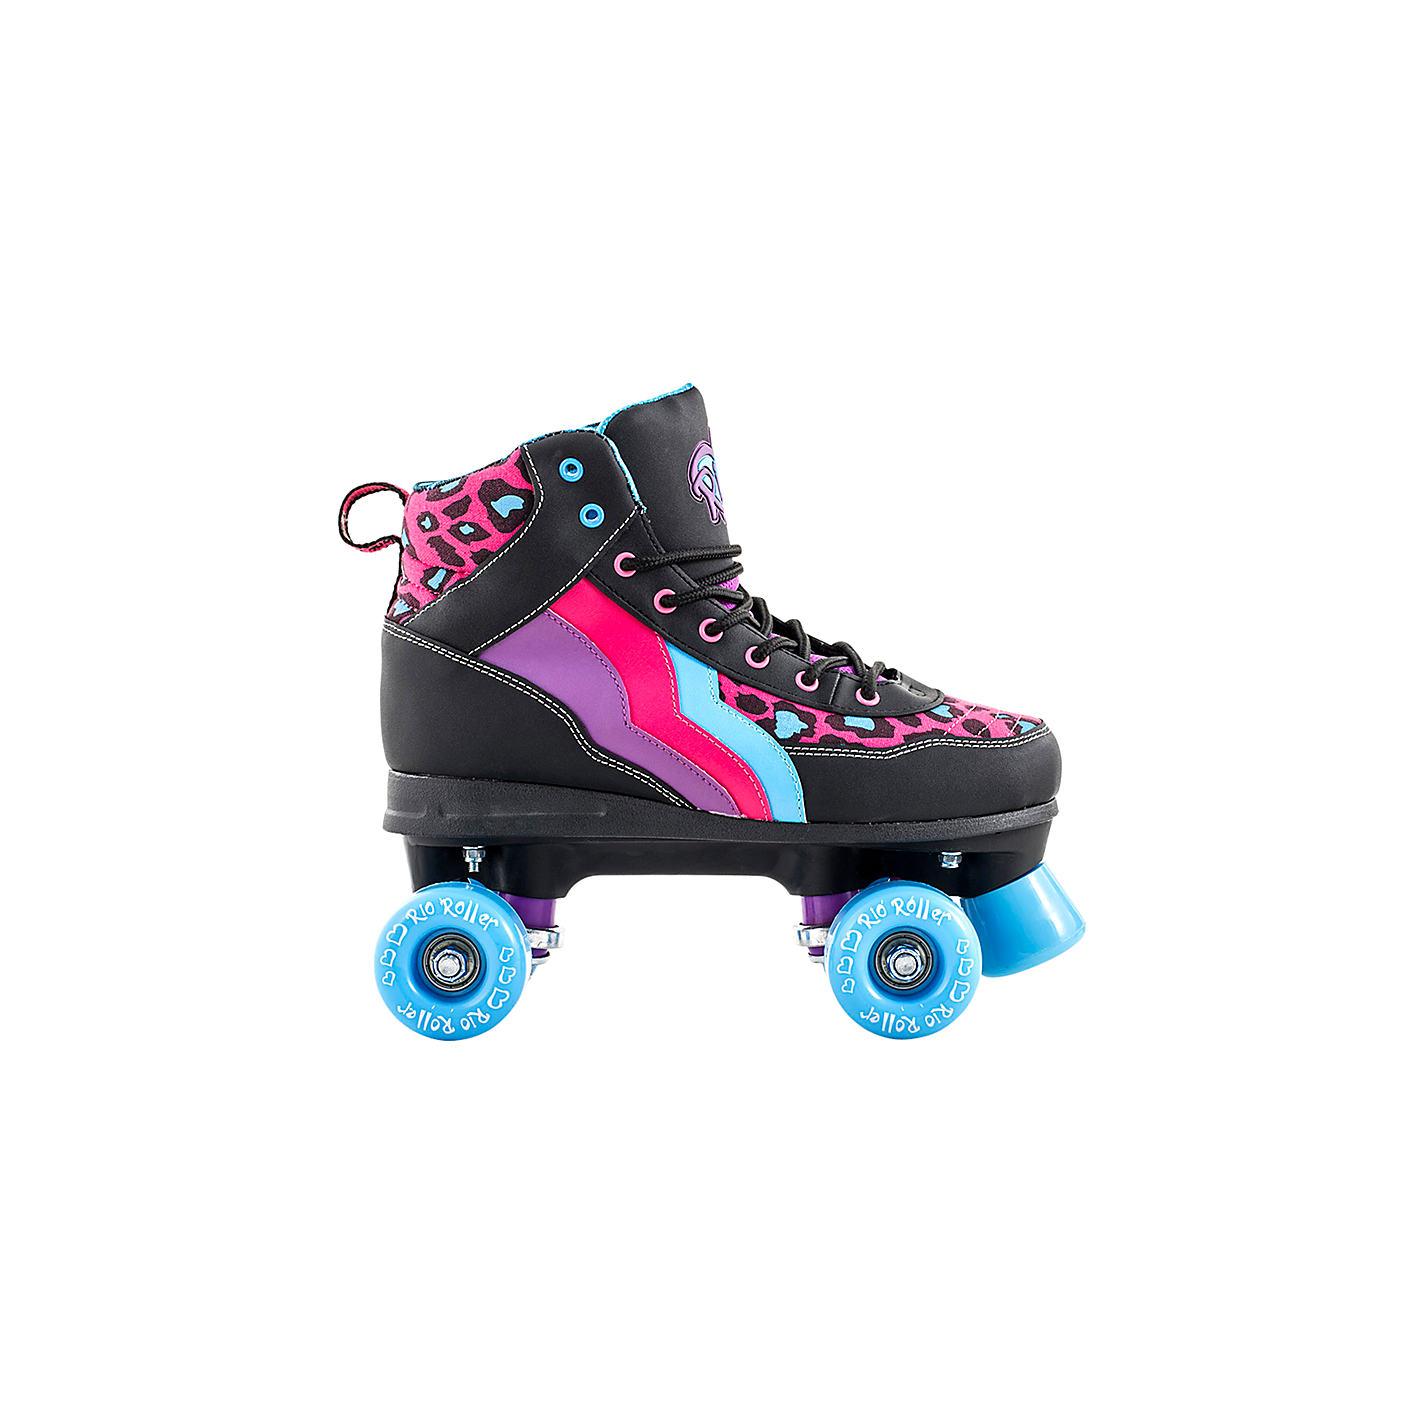 Buy roller shoes online australia -  Buy Rio Roller Skates Online At Johnlewis Com